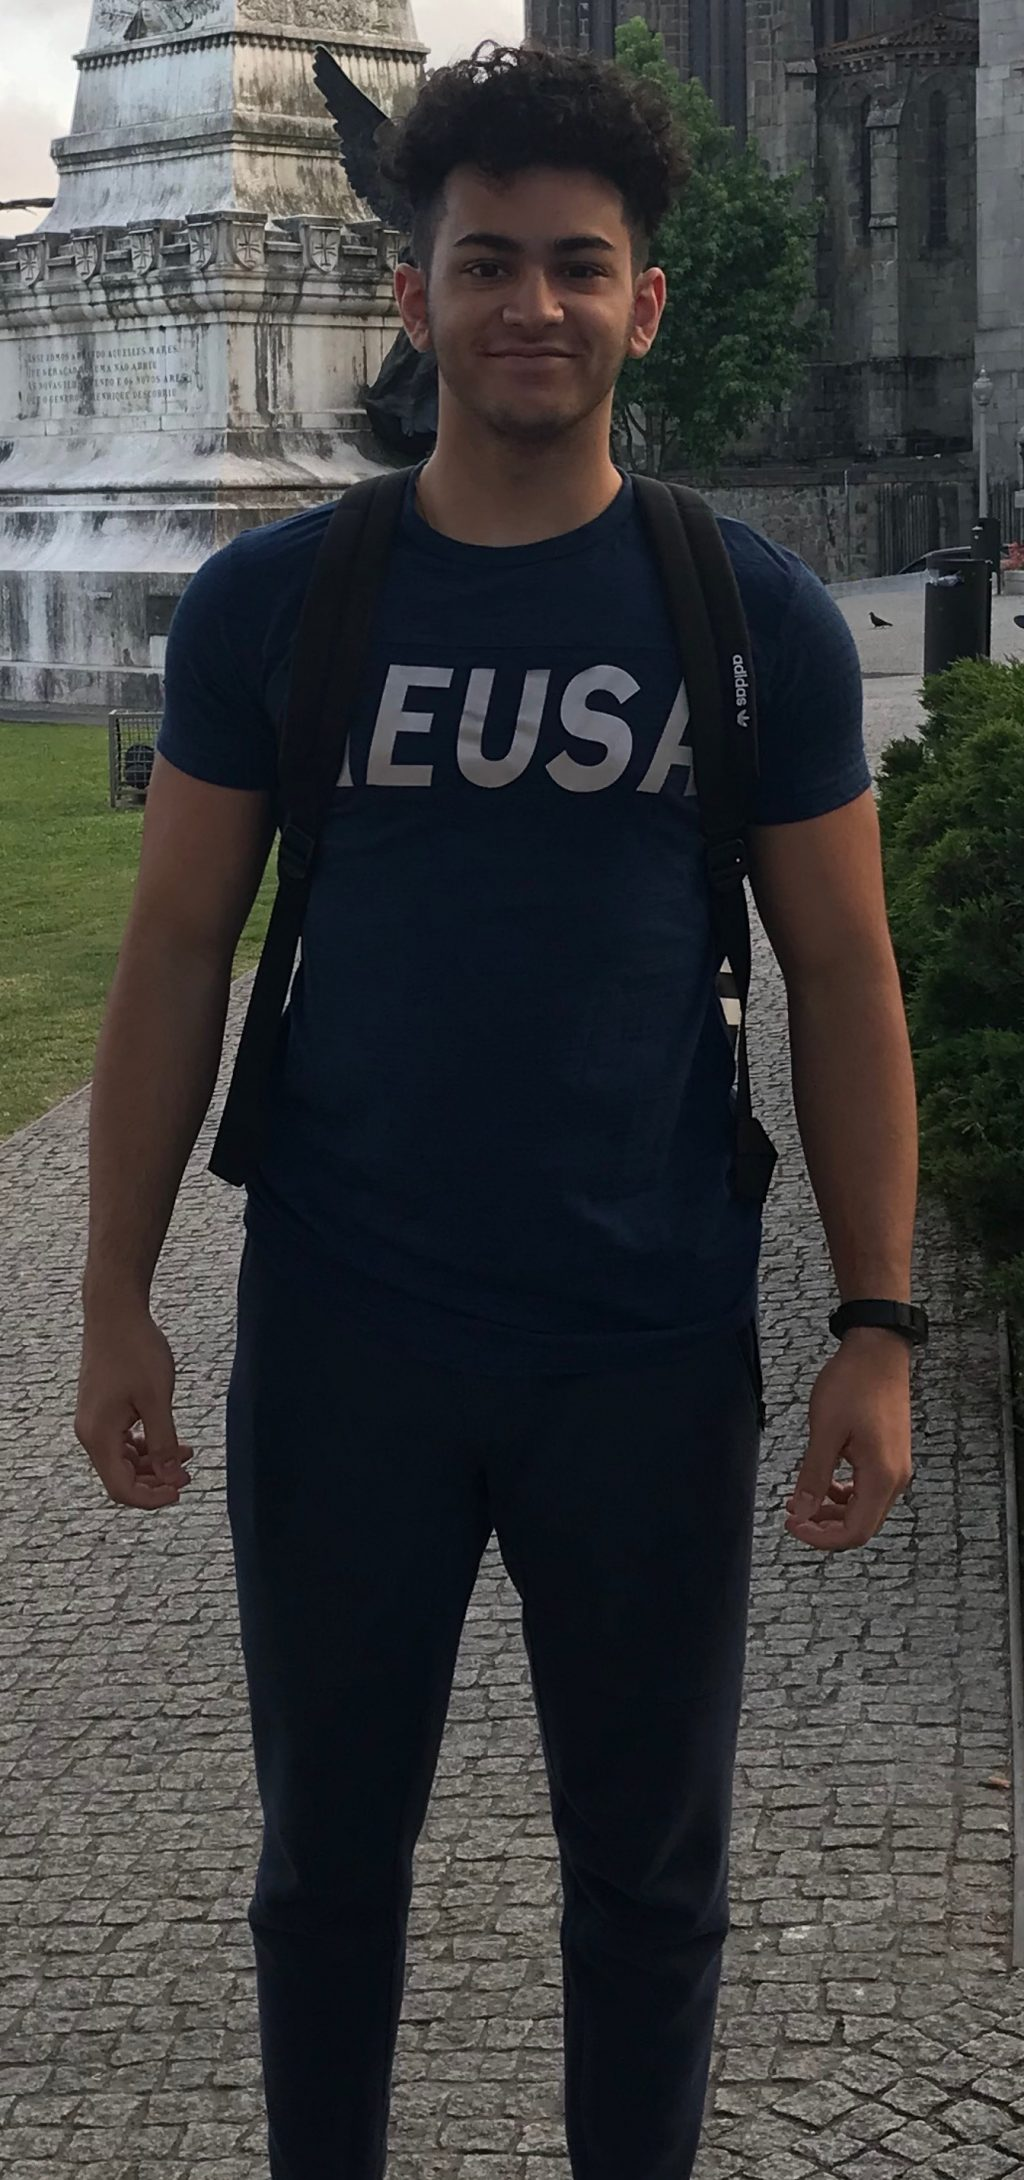 Personal Trainer Dallas, Texas - Saahir Hussain